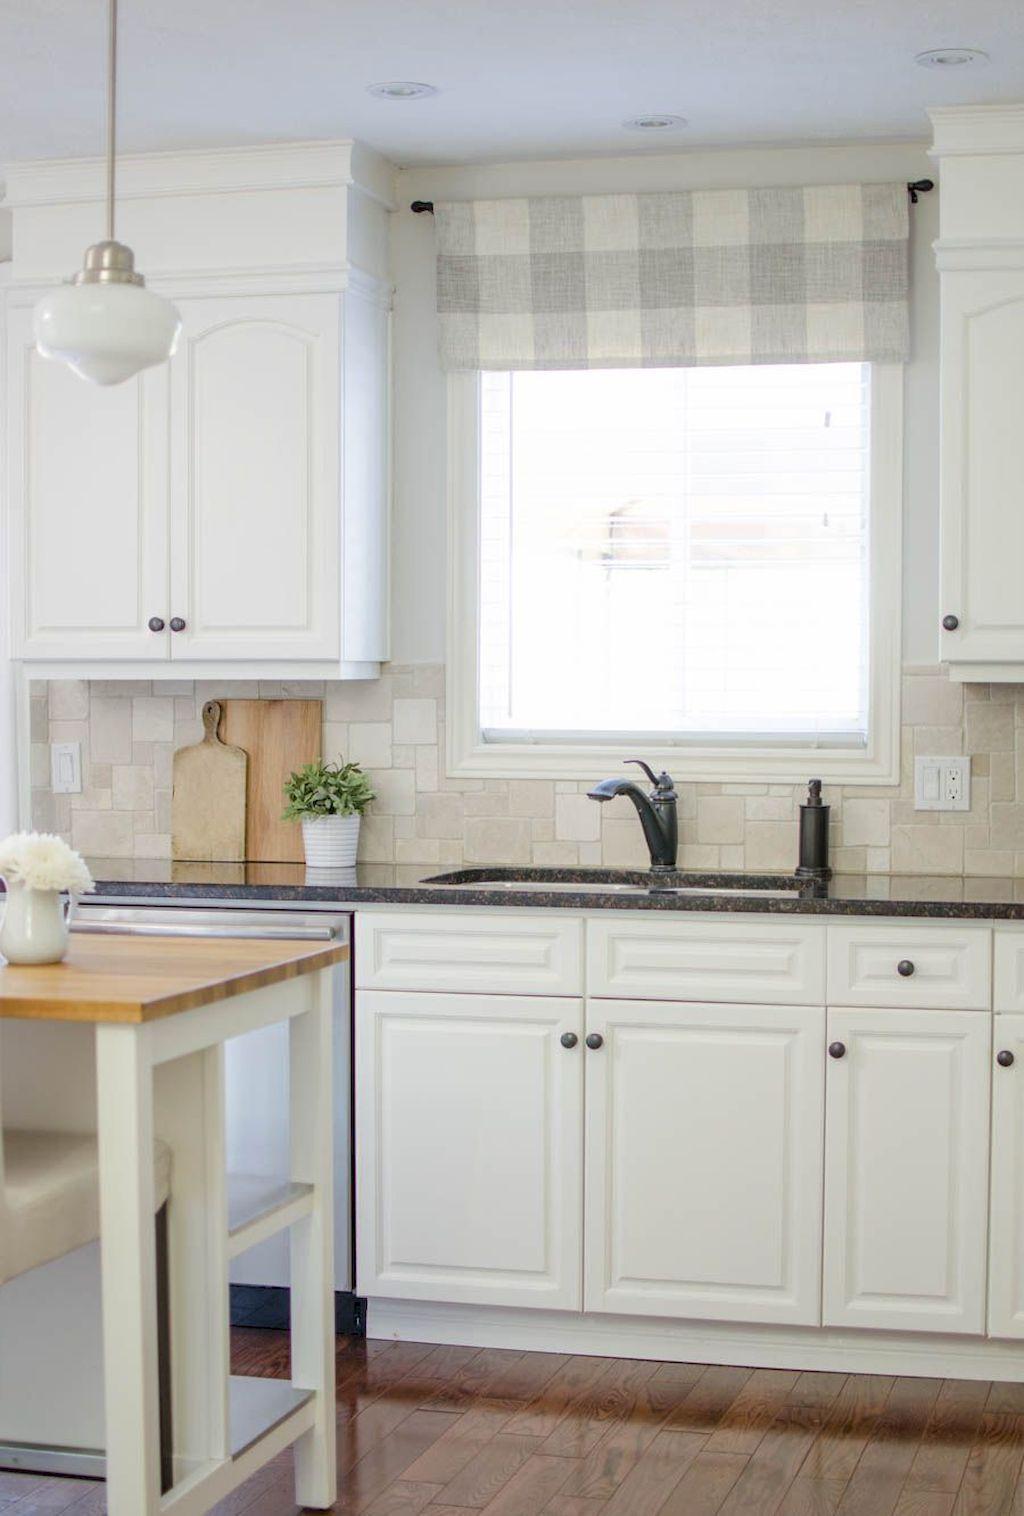 kitchen window treatments ideas for less farmhouse kitchen curtains kitchen window valances on farmhouse kitchen window id=86118